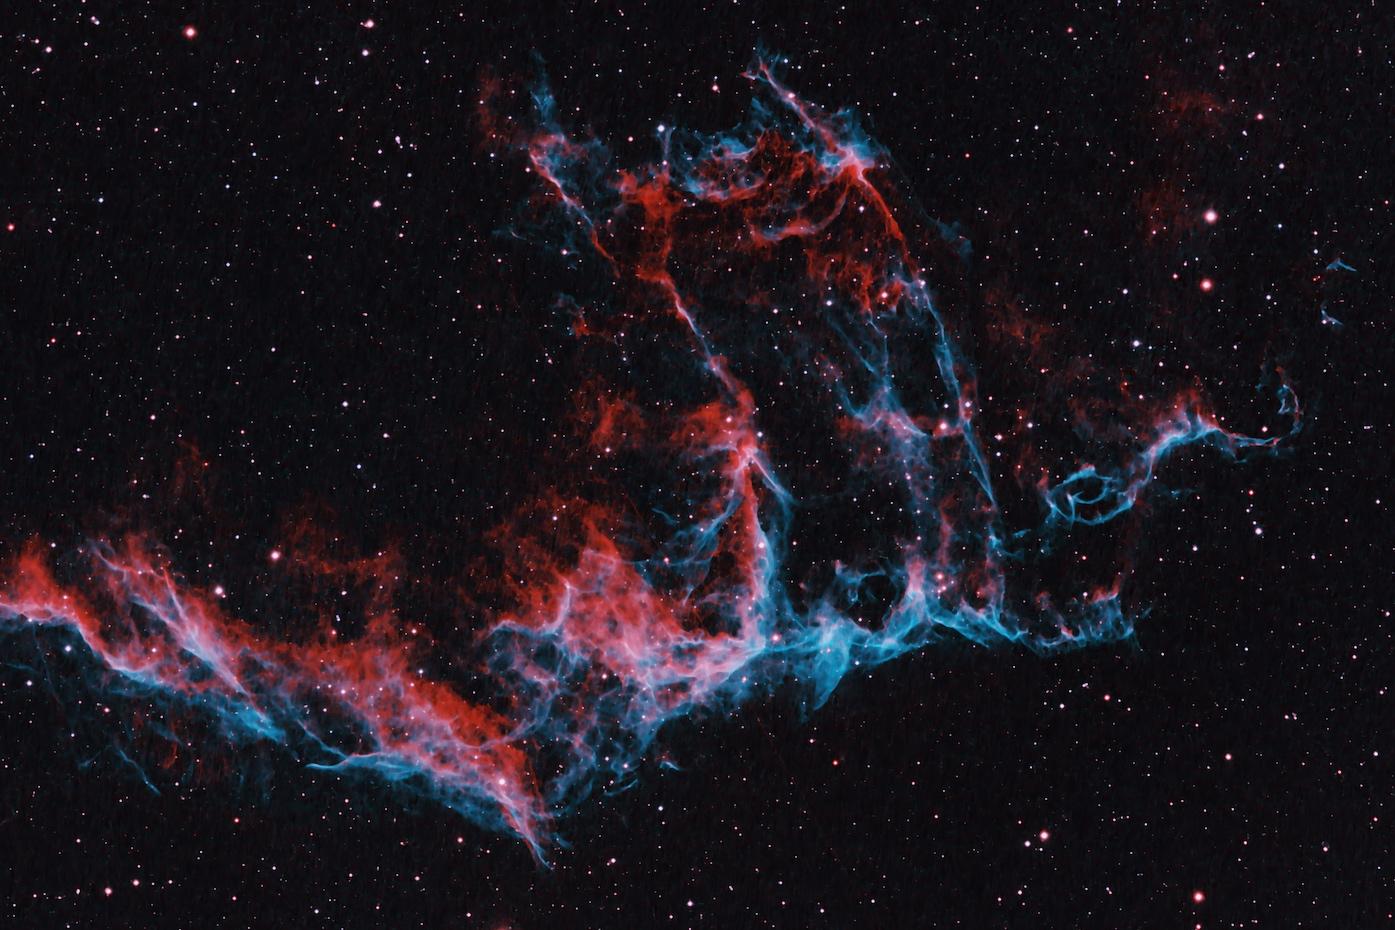 [Bild: NGC6995-x-1395x930-Kopie.jpg]